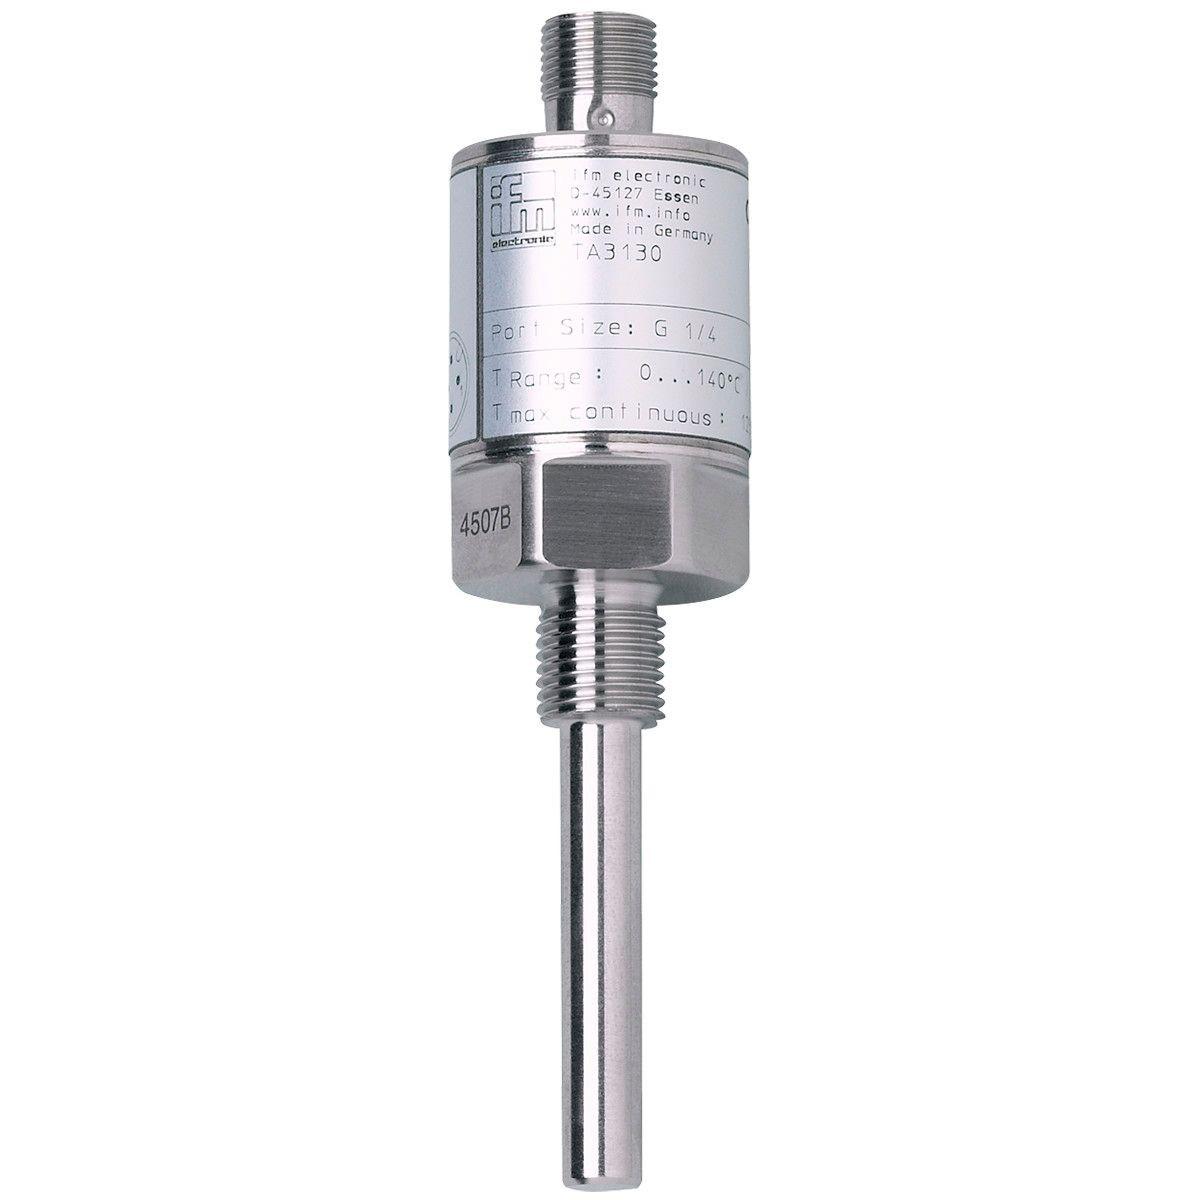 Ifm TA3130 TA-060.LDR14-A-ZVG/US Temperature Transmitter